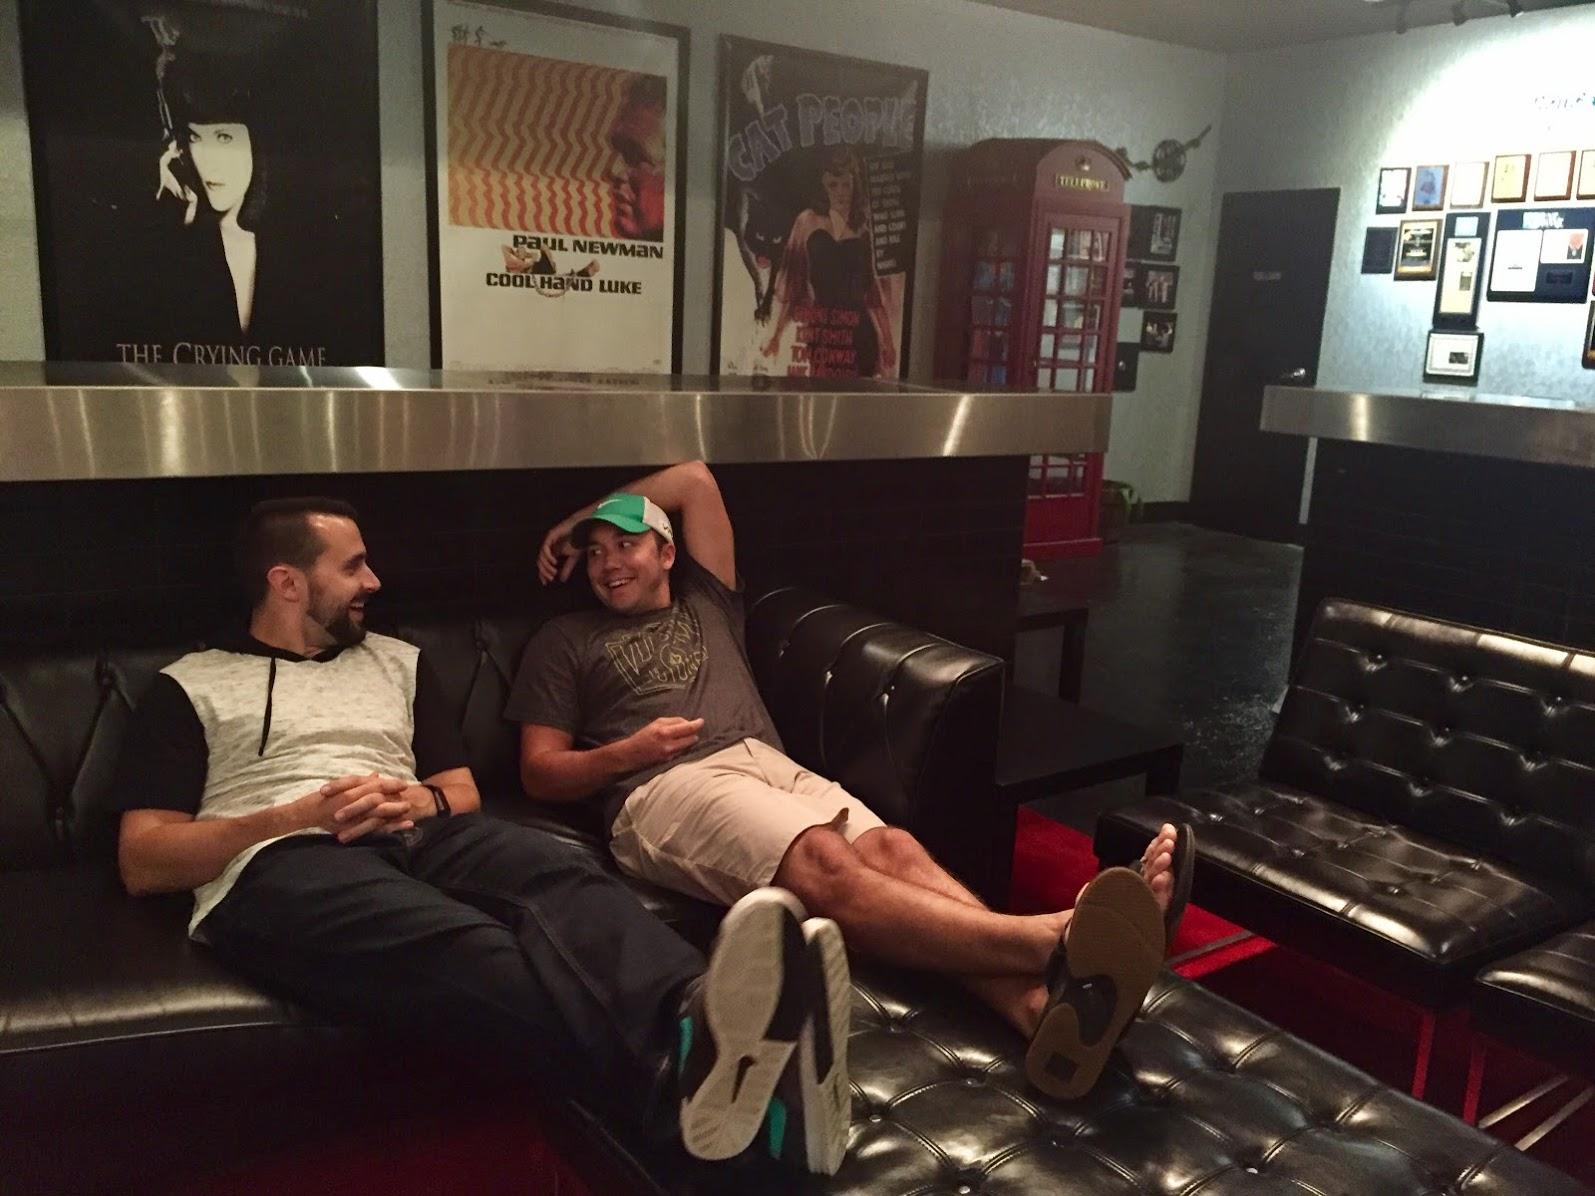 bromance at the movie theatre